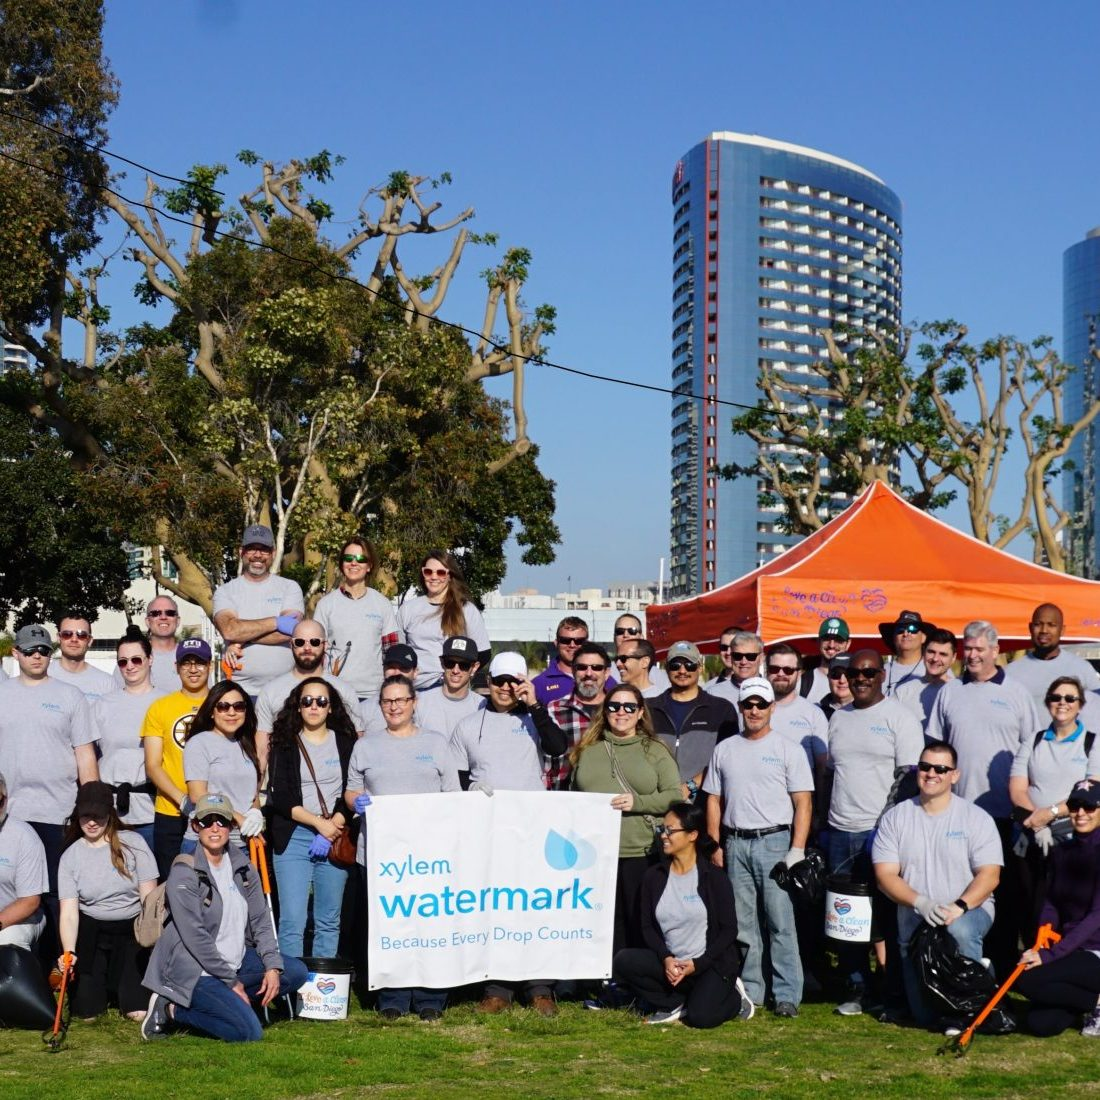 Corporate CleanBuilding Events